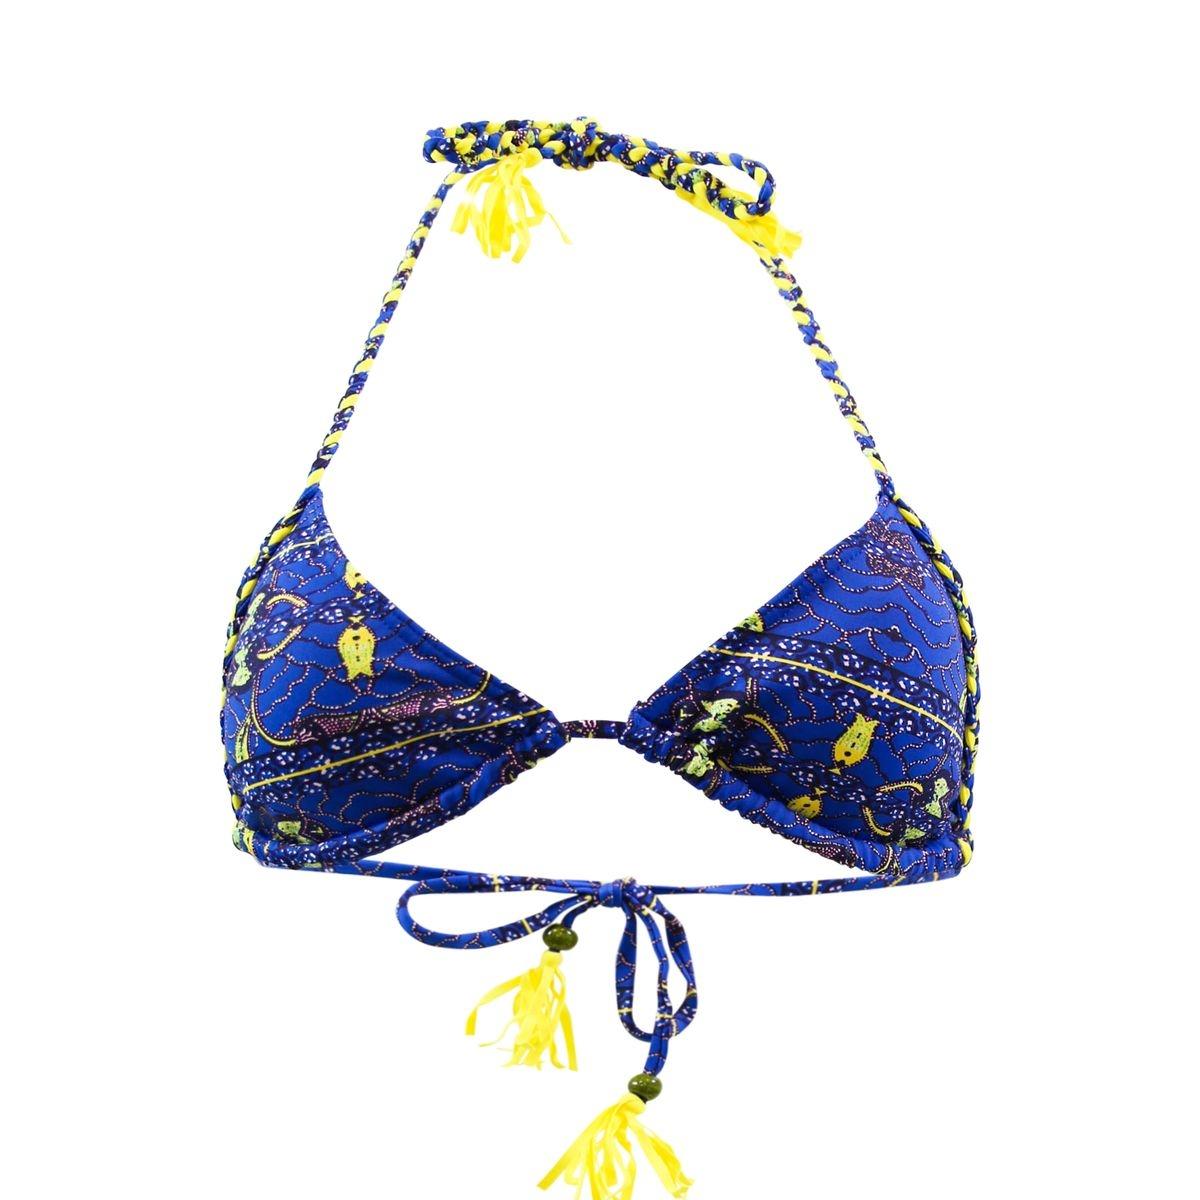 Maillot de bain Triangle Africain Bleu